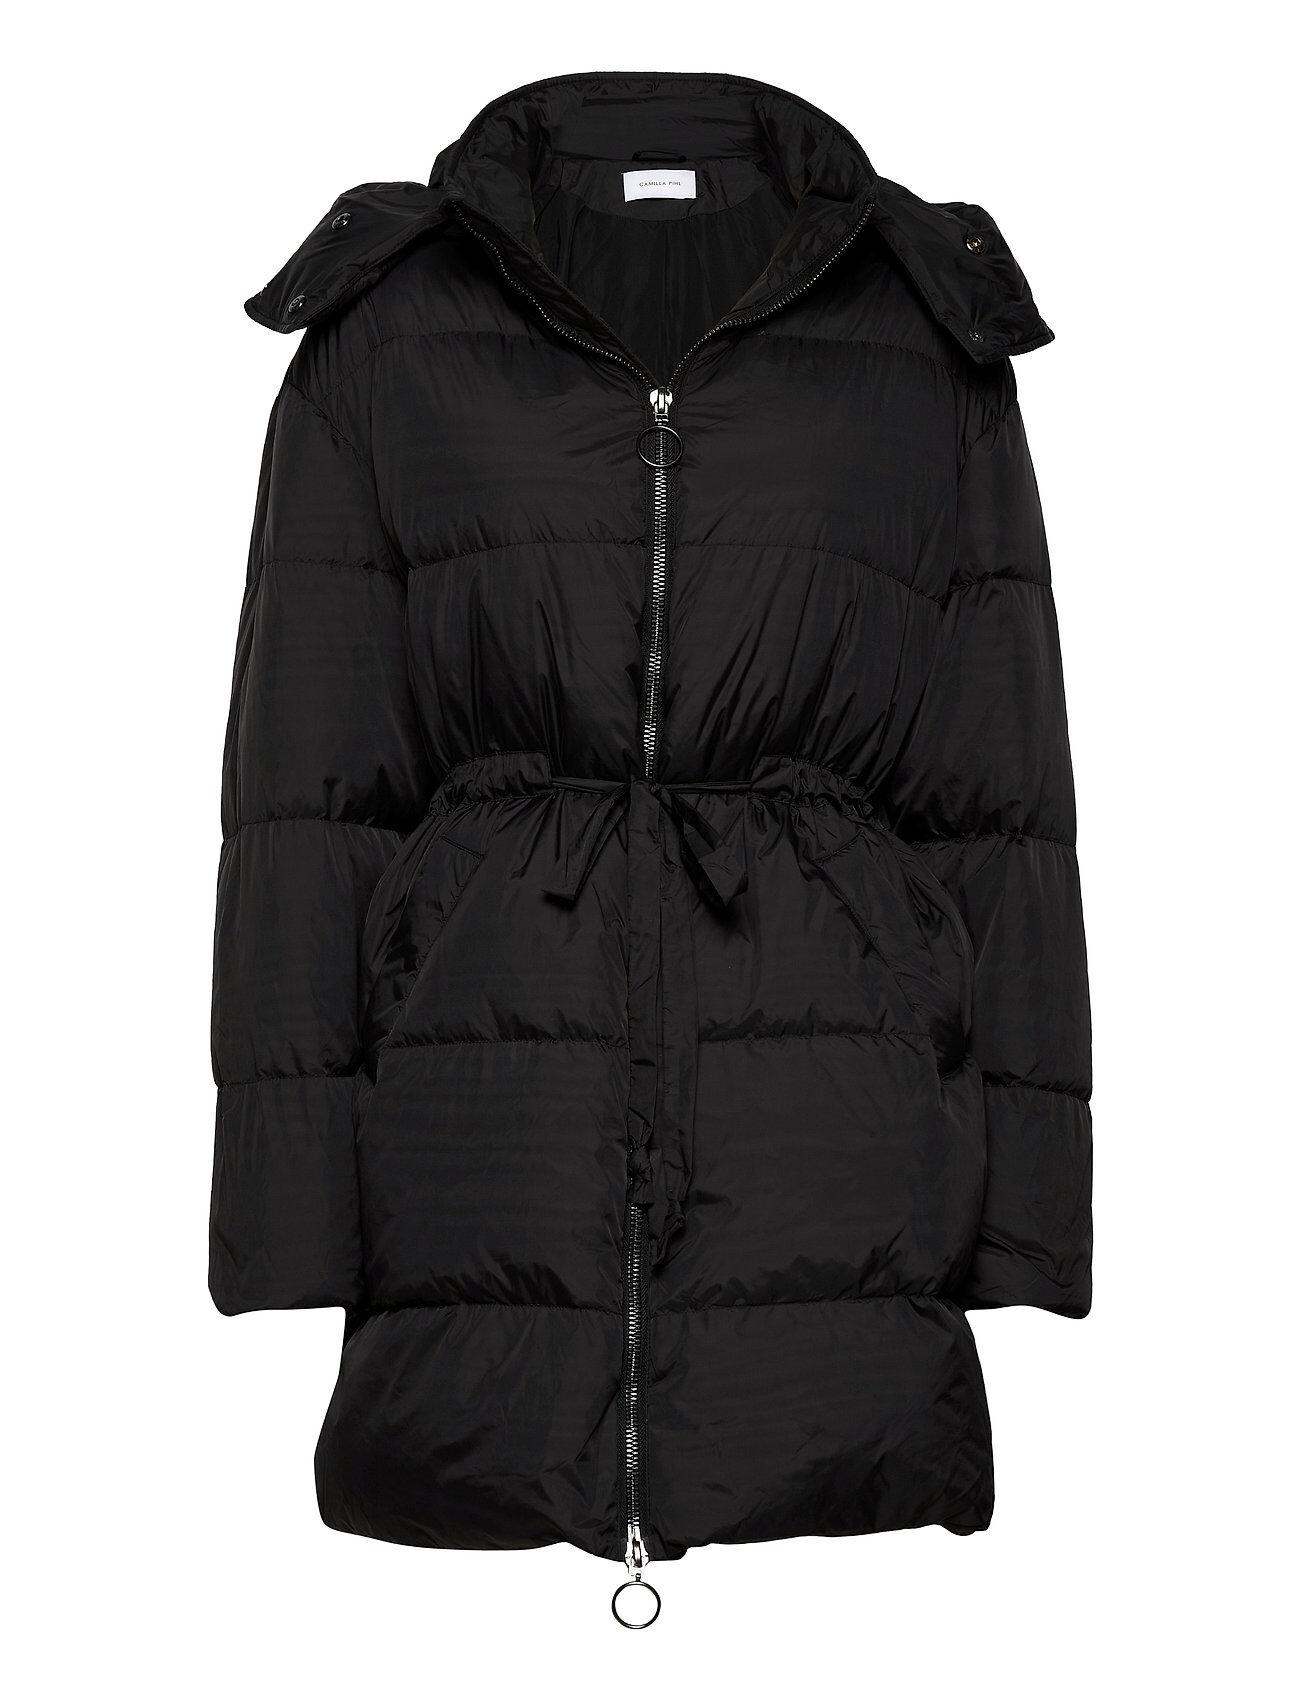 Camilla Pihl Cloud Jacket Vuorillinen Takki Topattu Takki Musta Camilla Pihl